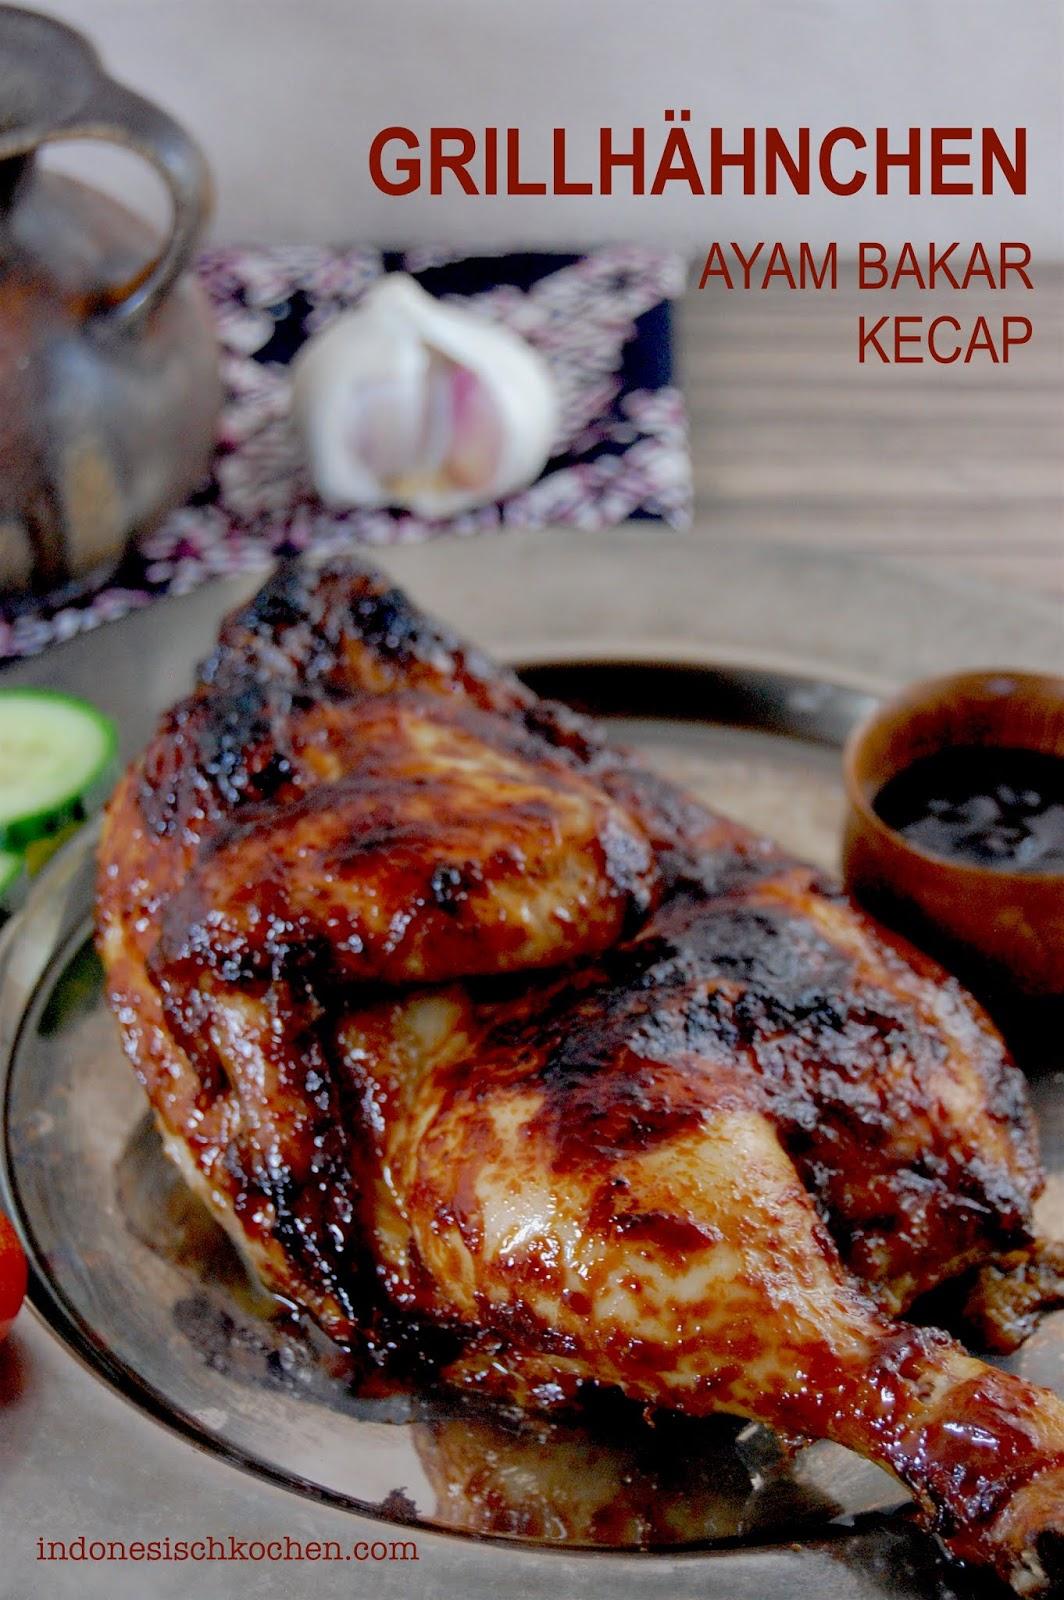 Rezept Ayam Bakar Kecap, Grillhähchen Kecap Manis Marinade